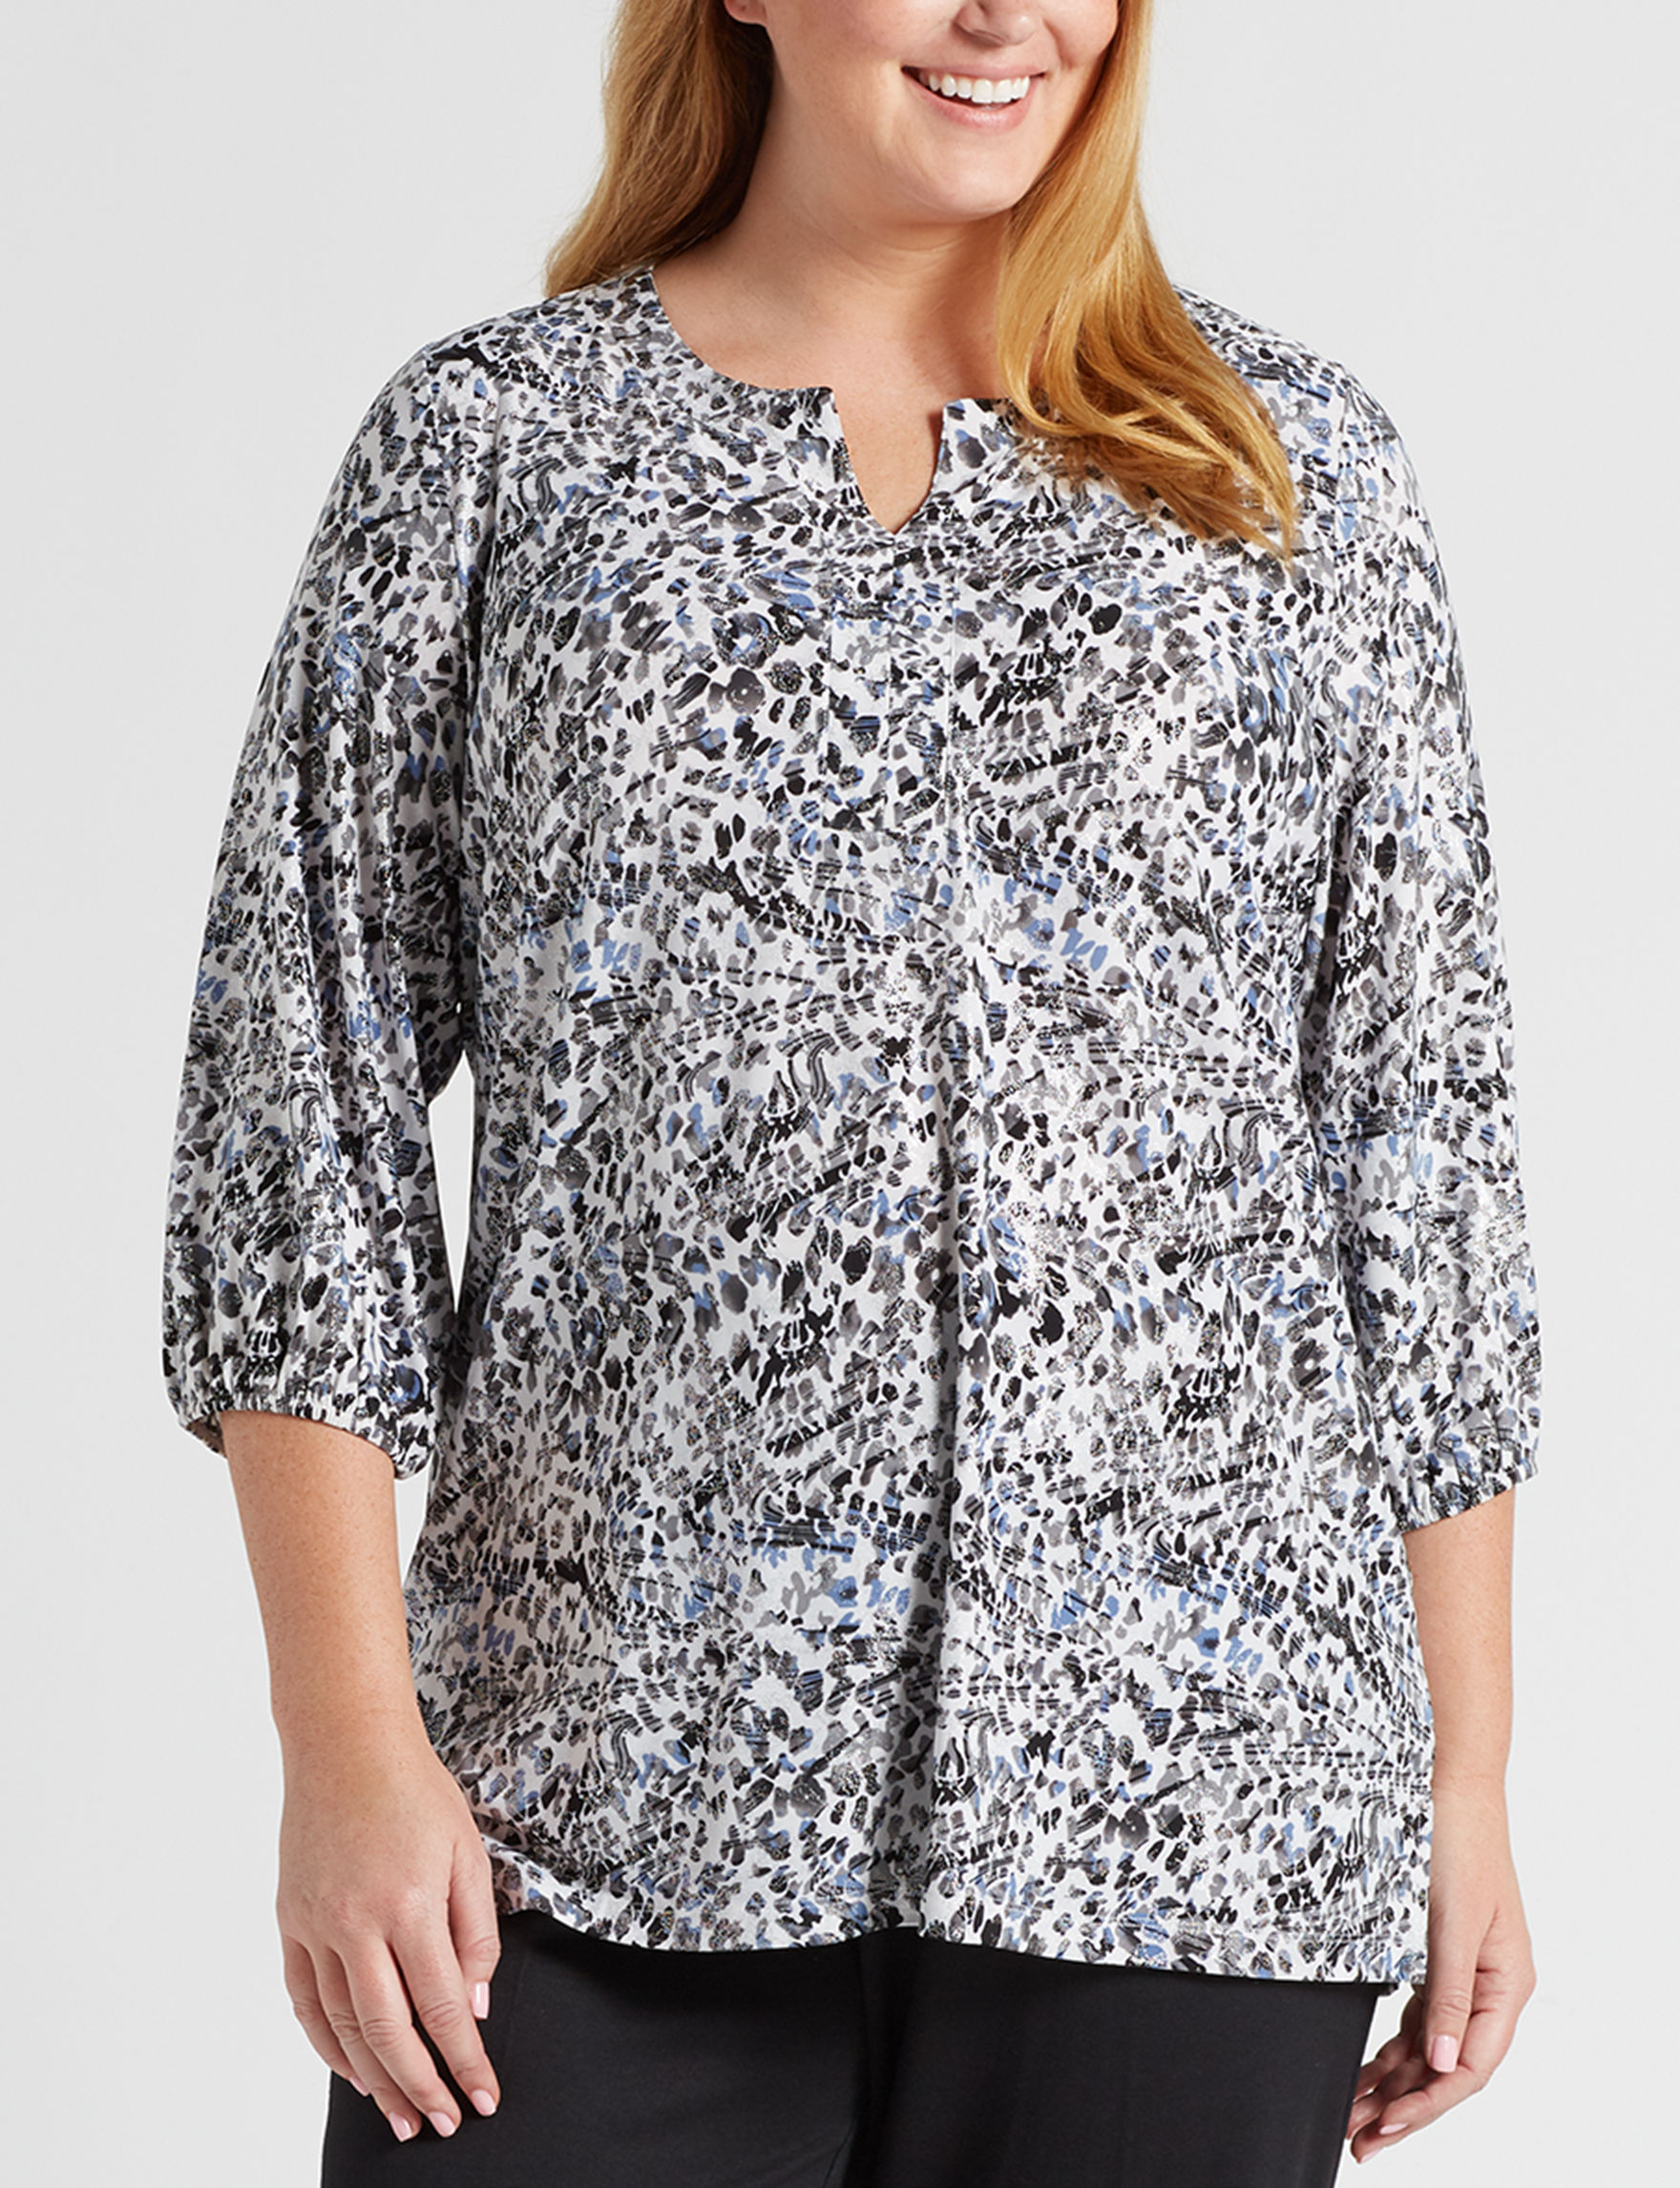 Rebecca Malone Grey / Black / White Shirts & Blouses